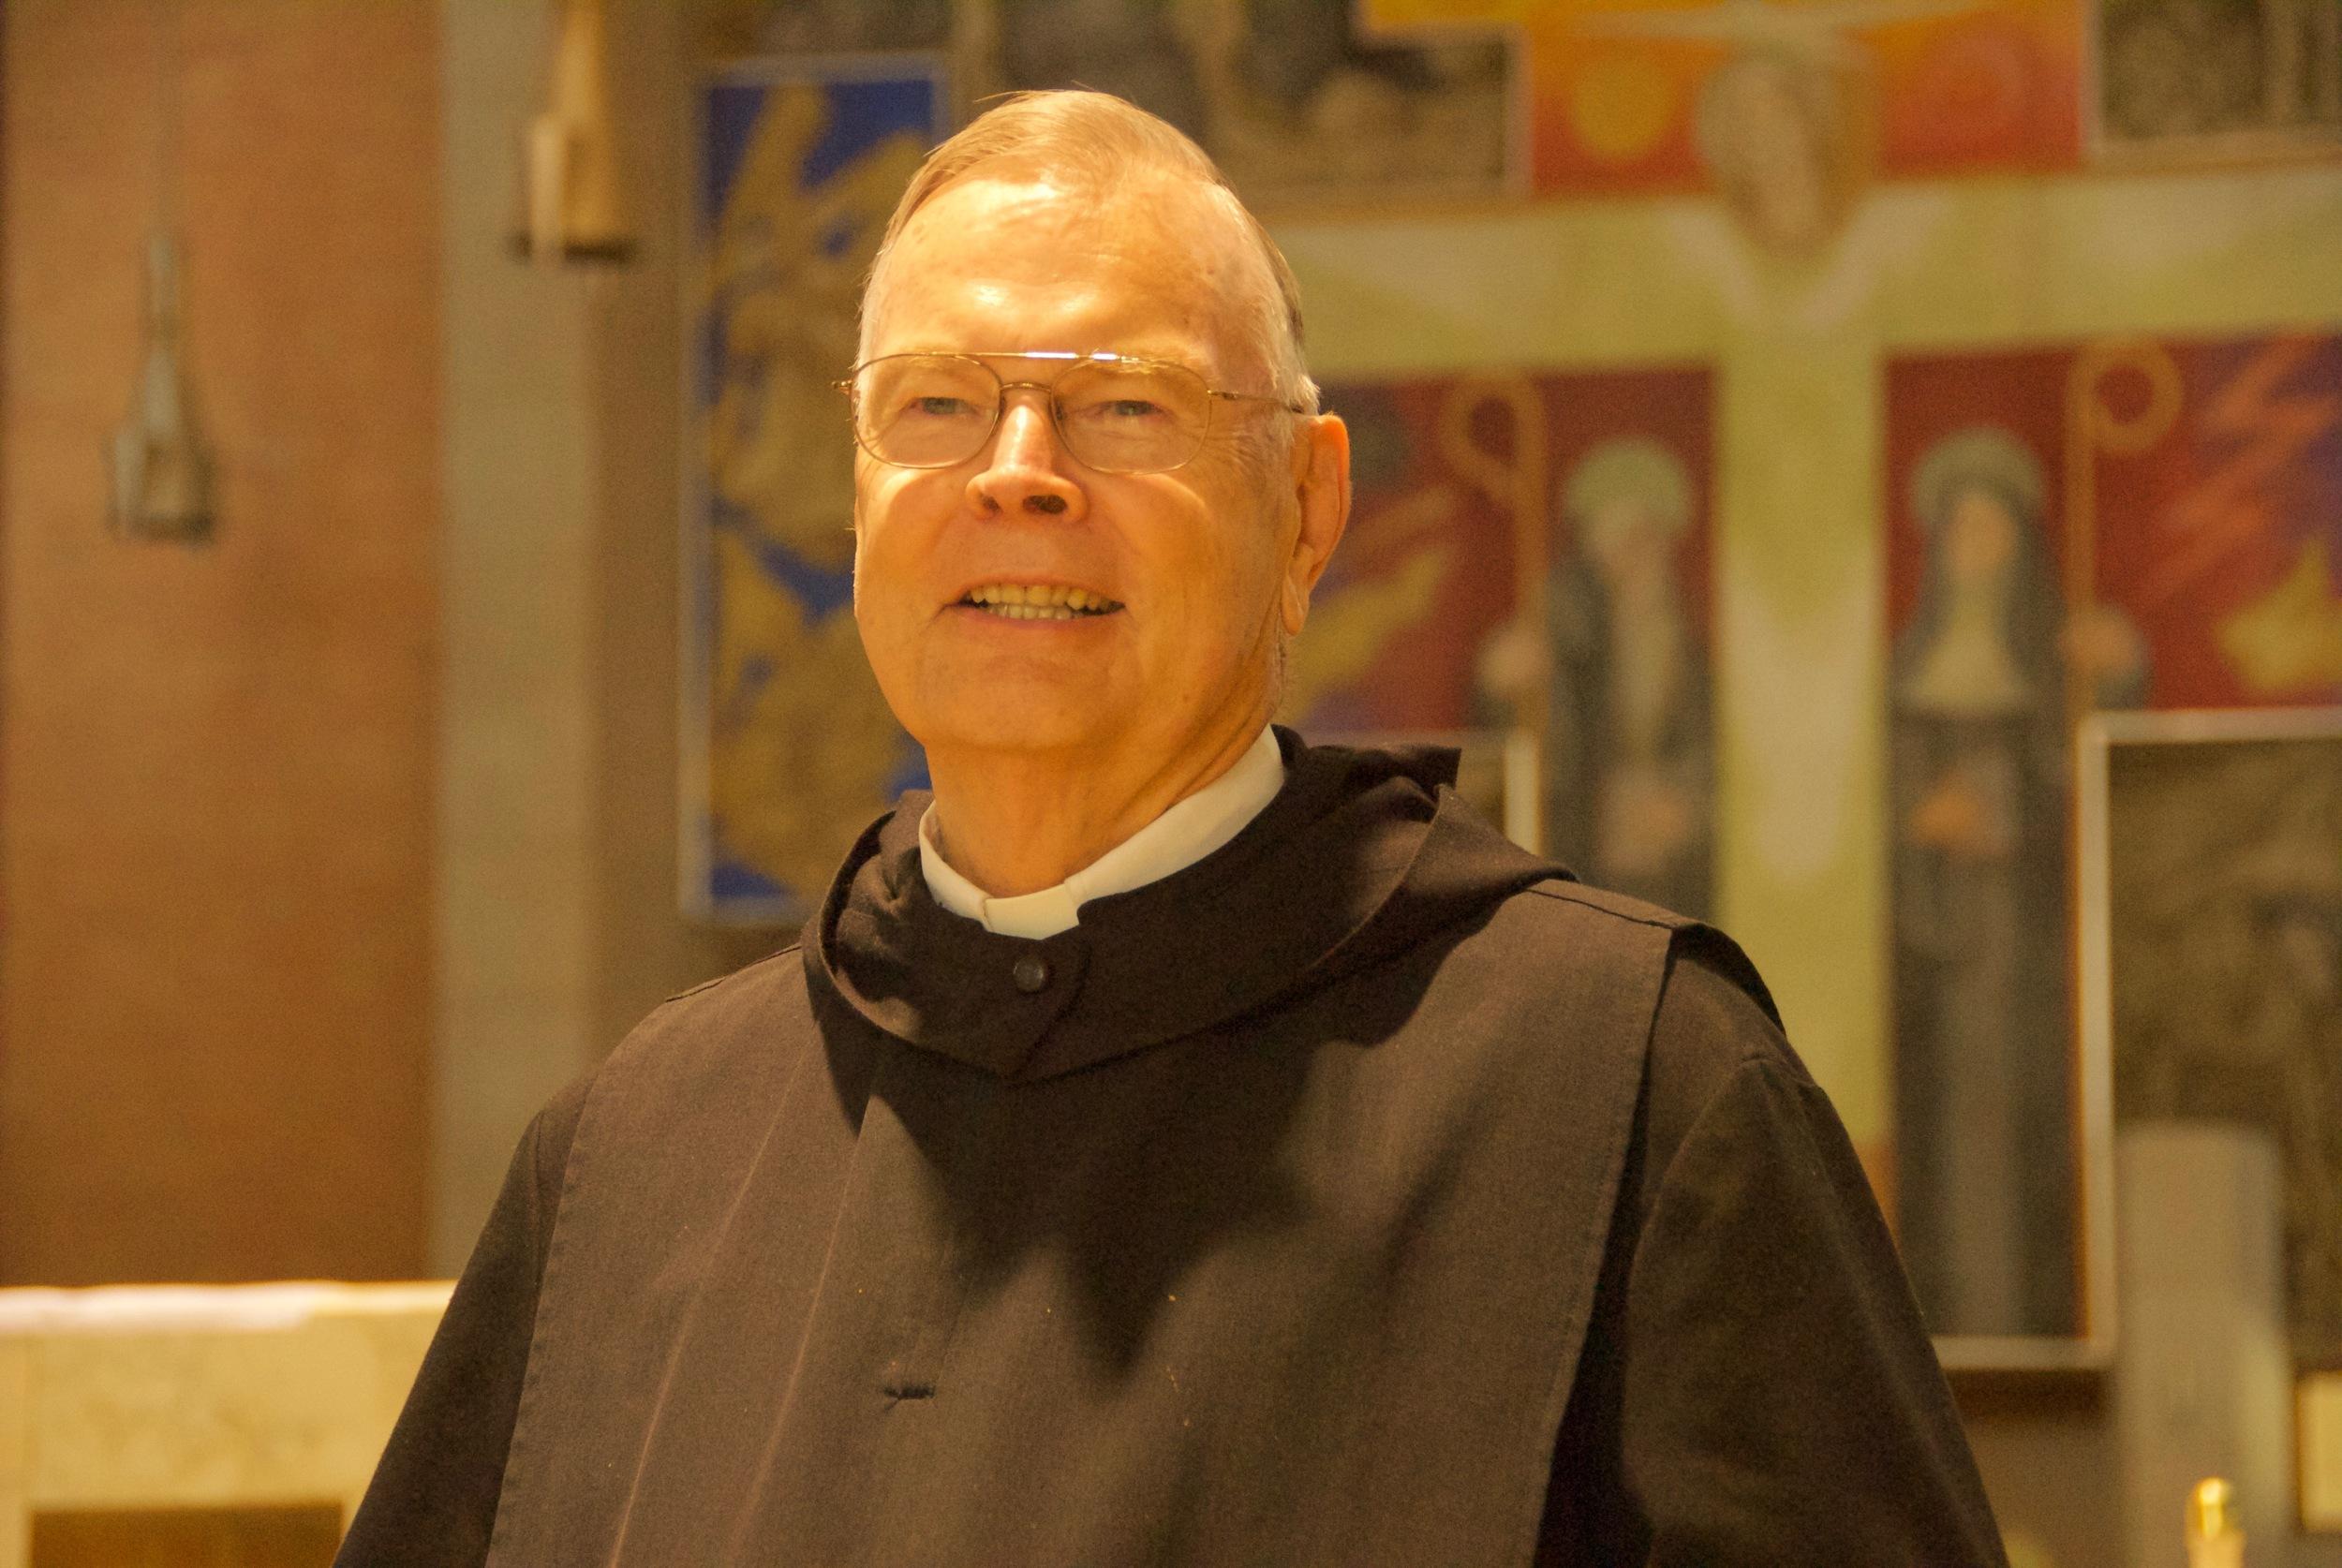 Fr. Roderic Giller -Chaplain,Jurisdictional Regional Correctional Facility and the Disciplinary Barracks at Fort Leavenworth